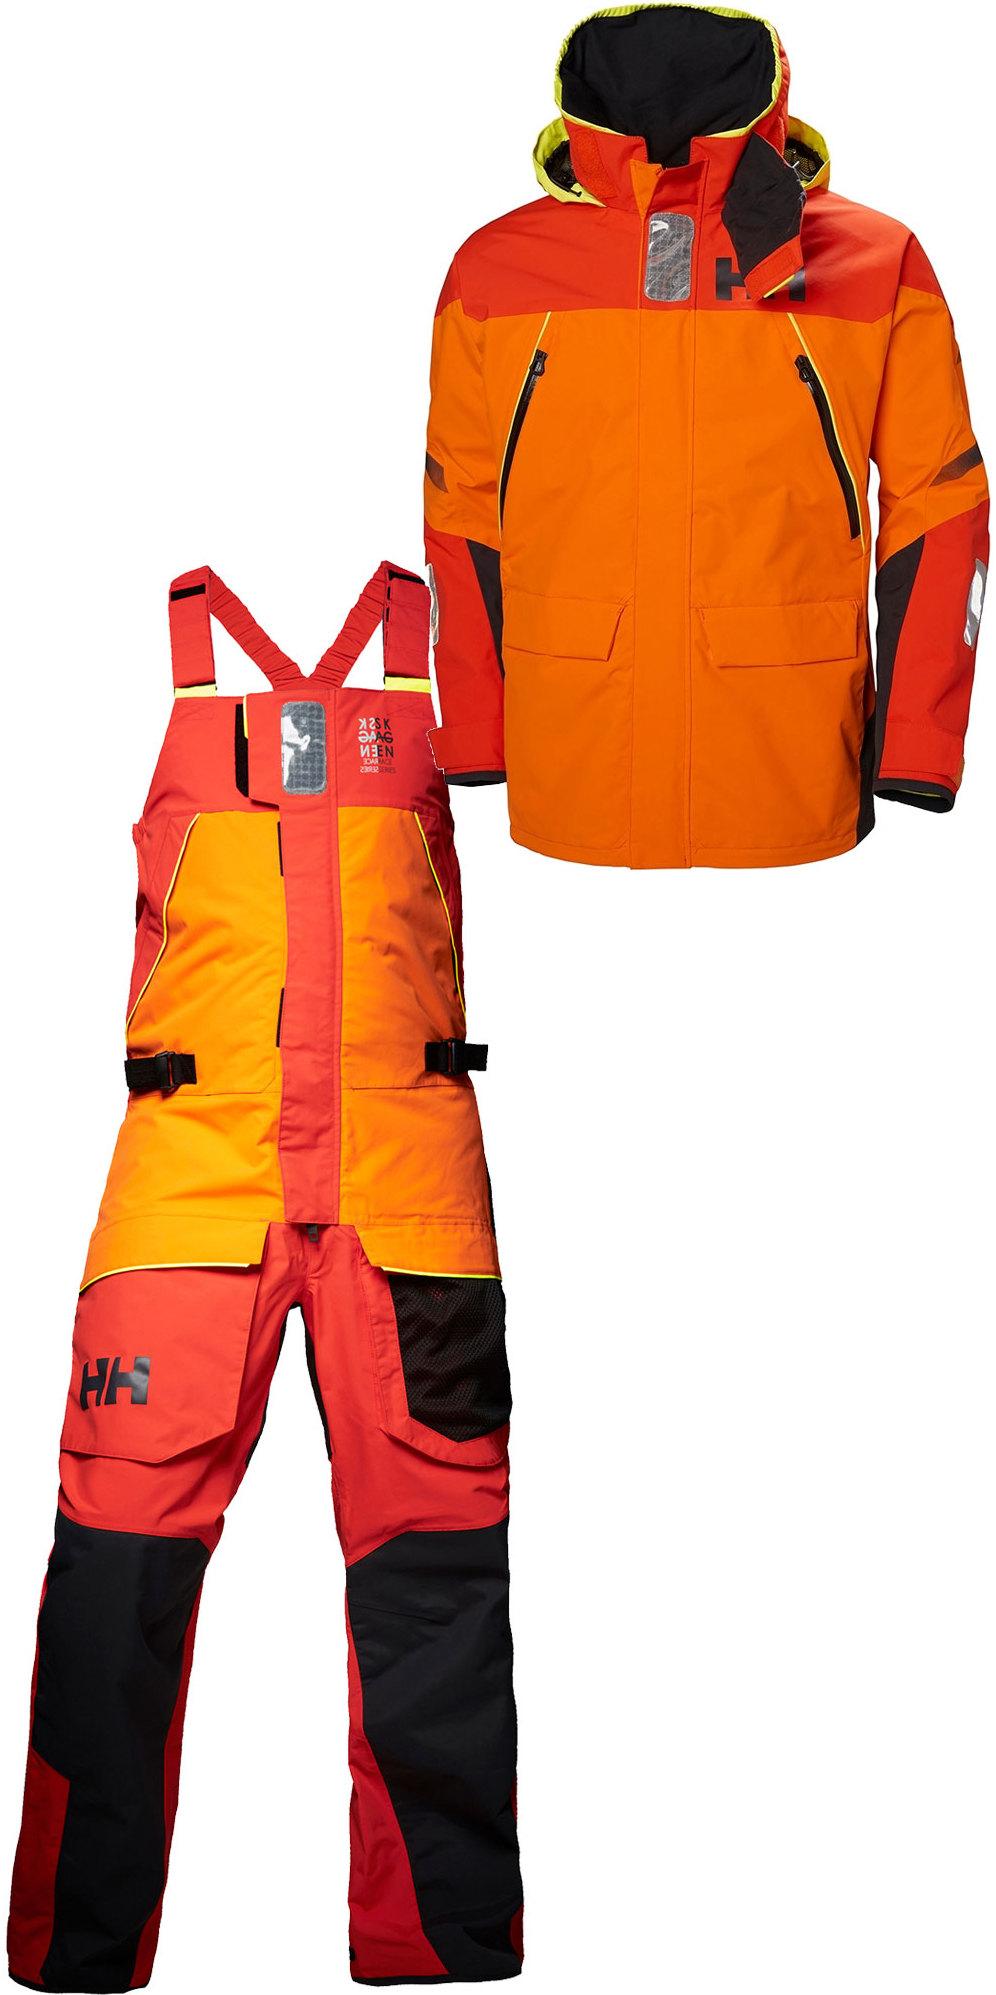 290399b43ed82 Helly Hansen Skagen Offshore Jacket 33907 & Hose 33908 Kombi-Set Blaze  Orange ...